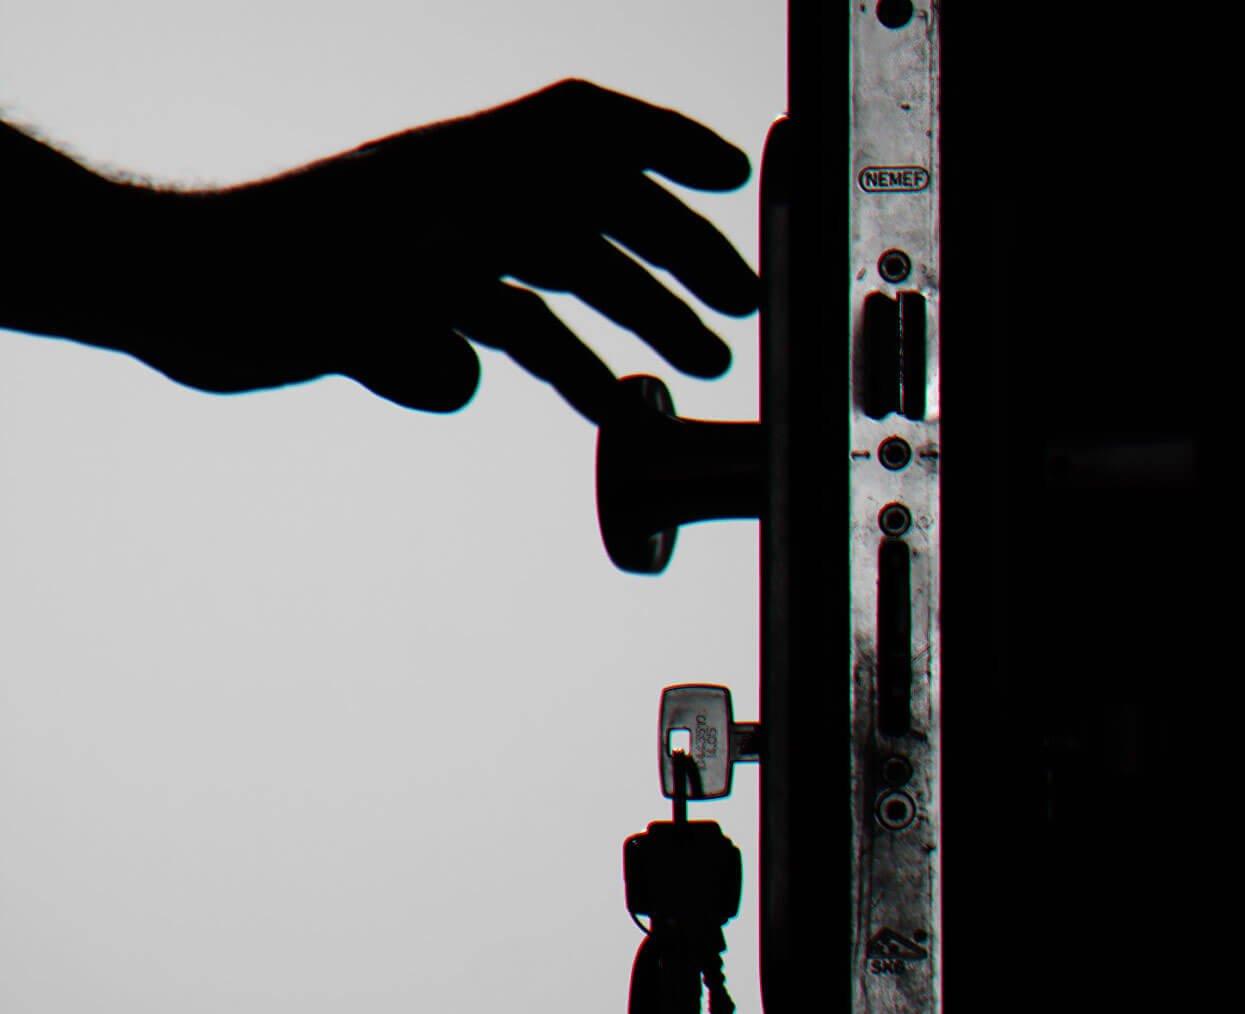 hotel security data breaches